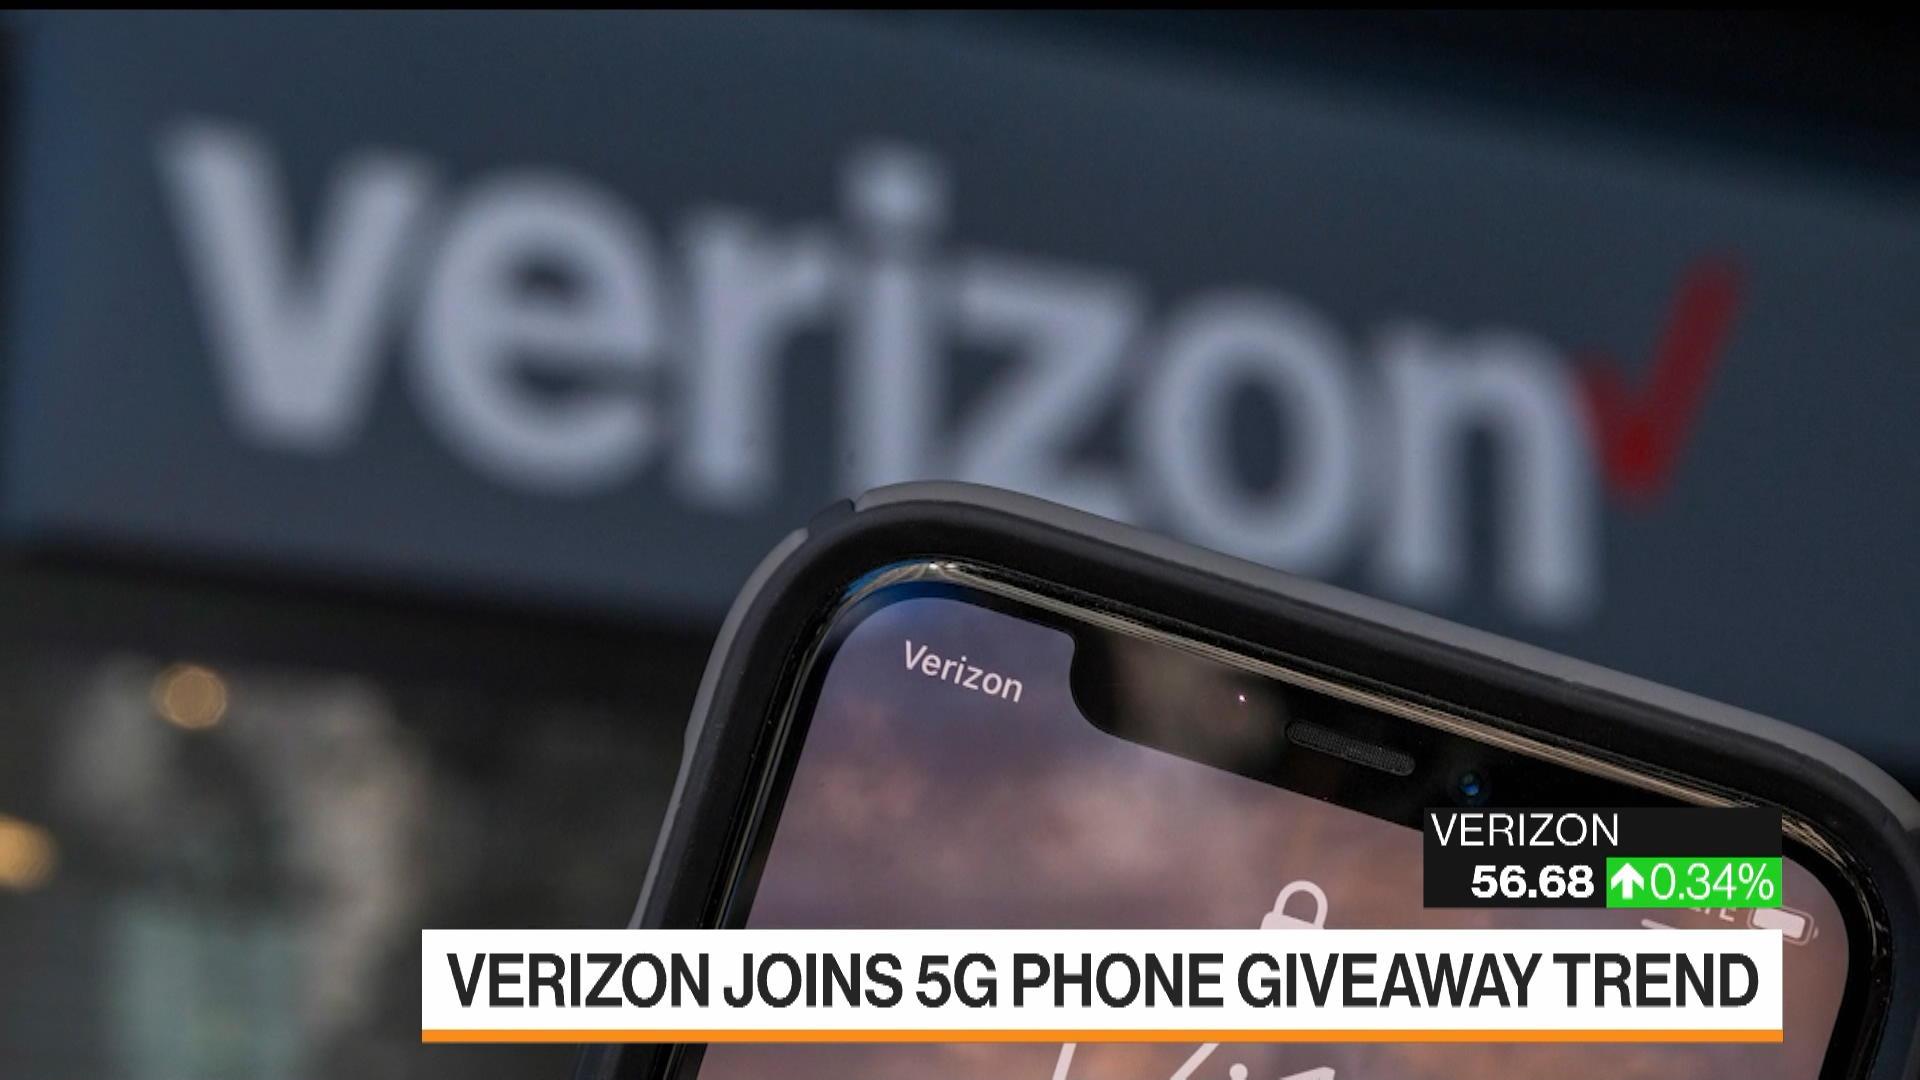 Verizon Giving Away Phones to New 5G Customers